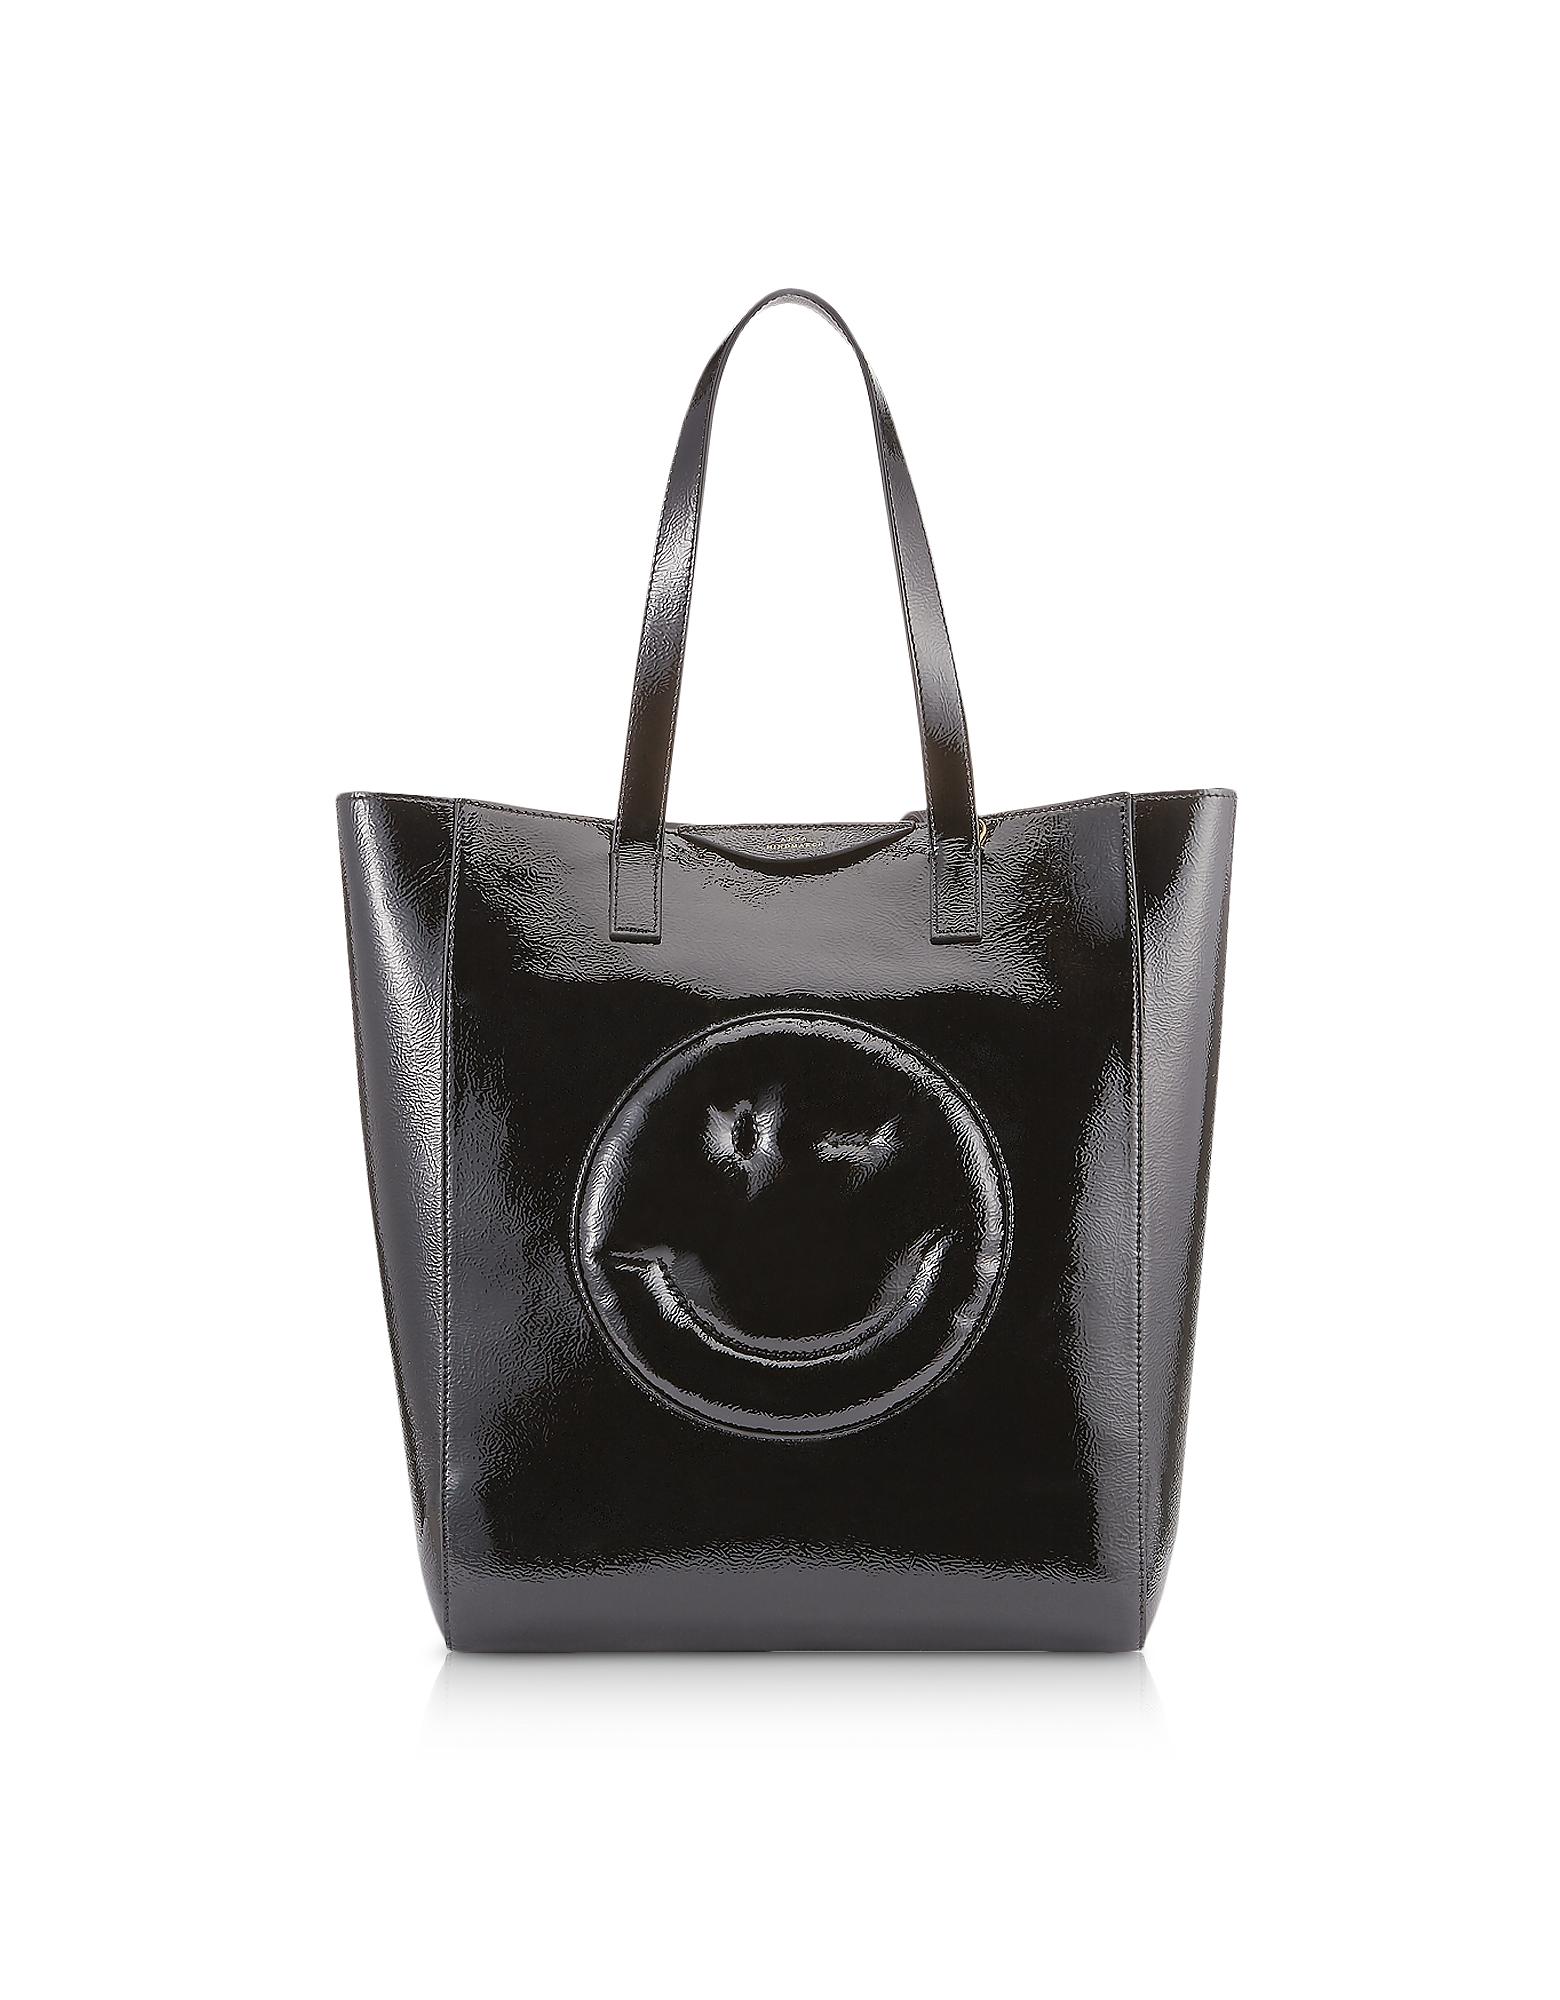 Image of Anya Hindmarch Designer Handbags, Black Naplak Chubby Wink Tote Bag